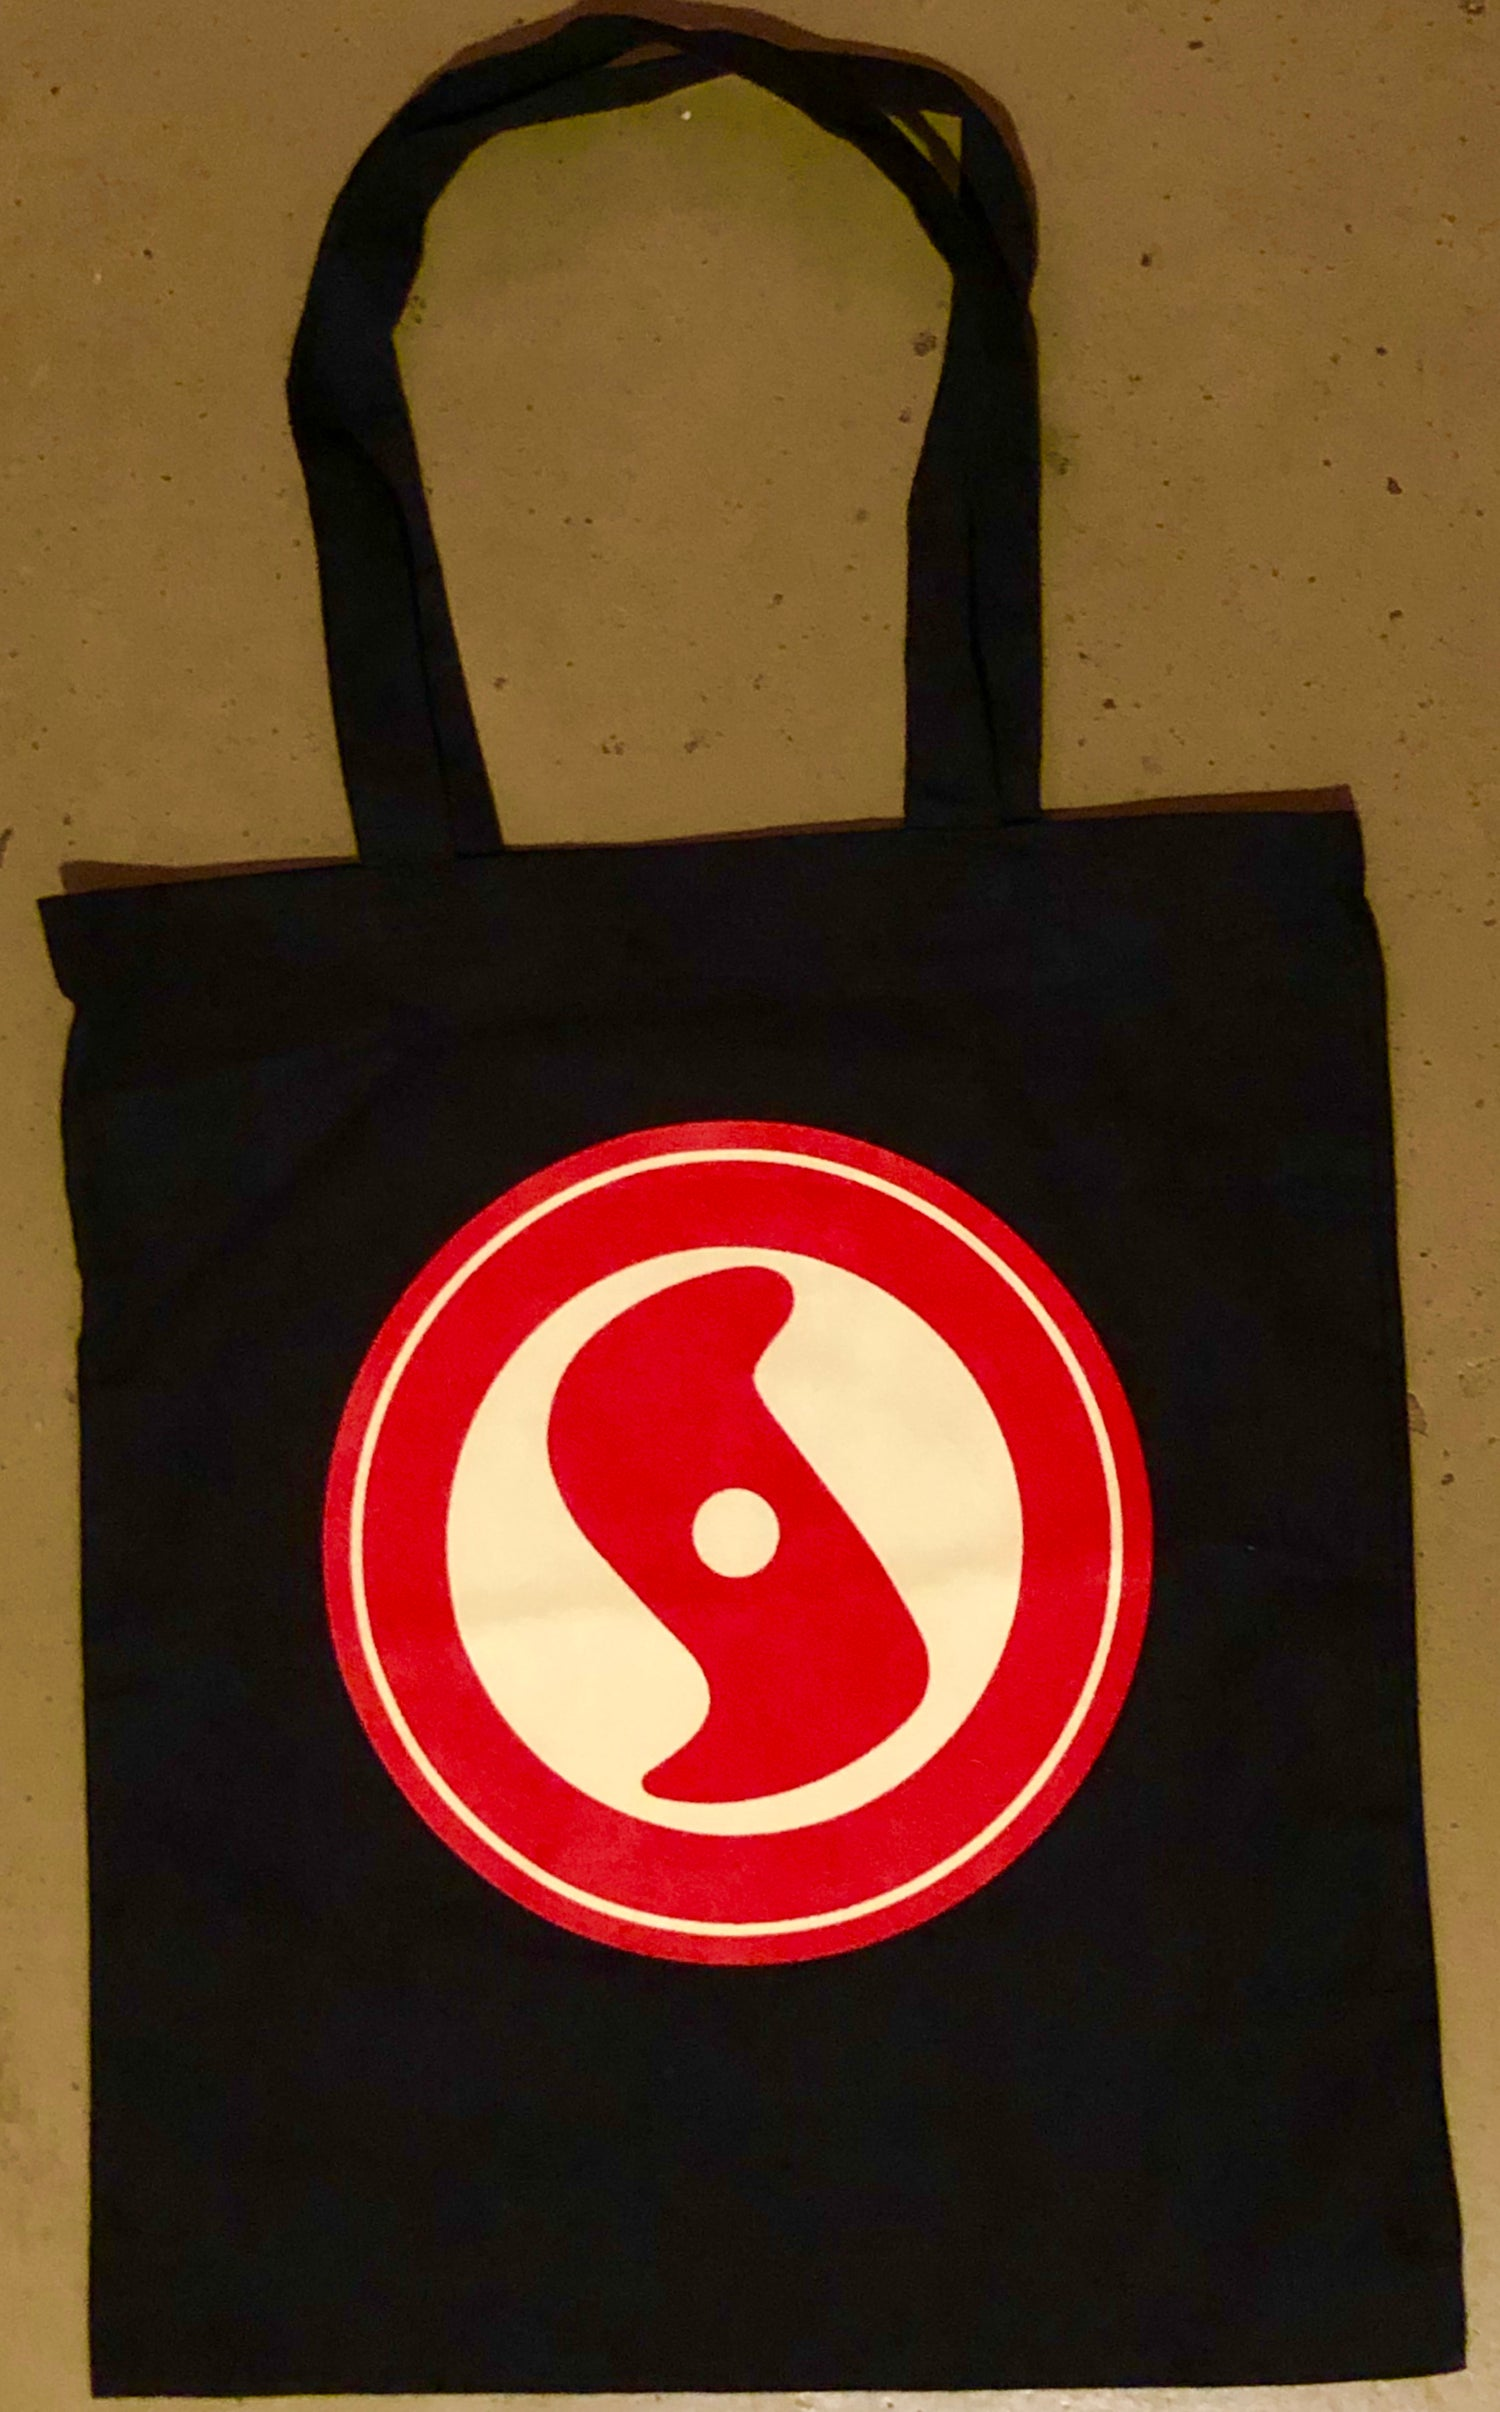 Image of New! Super Secret Records vinyl tote bag